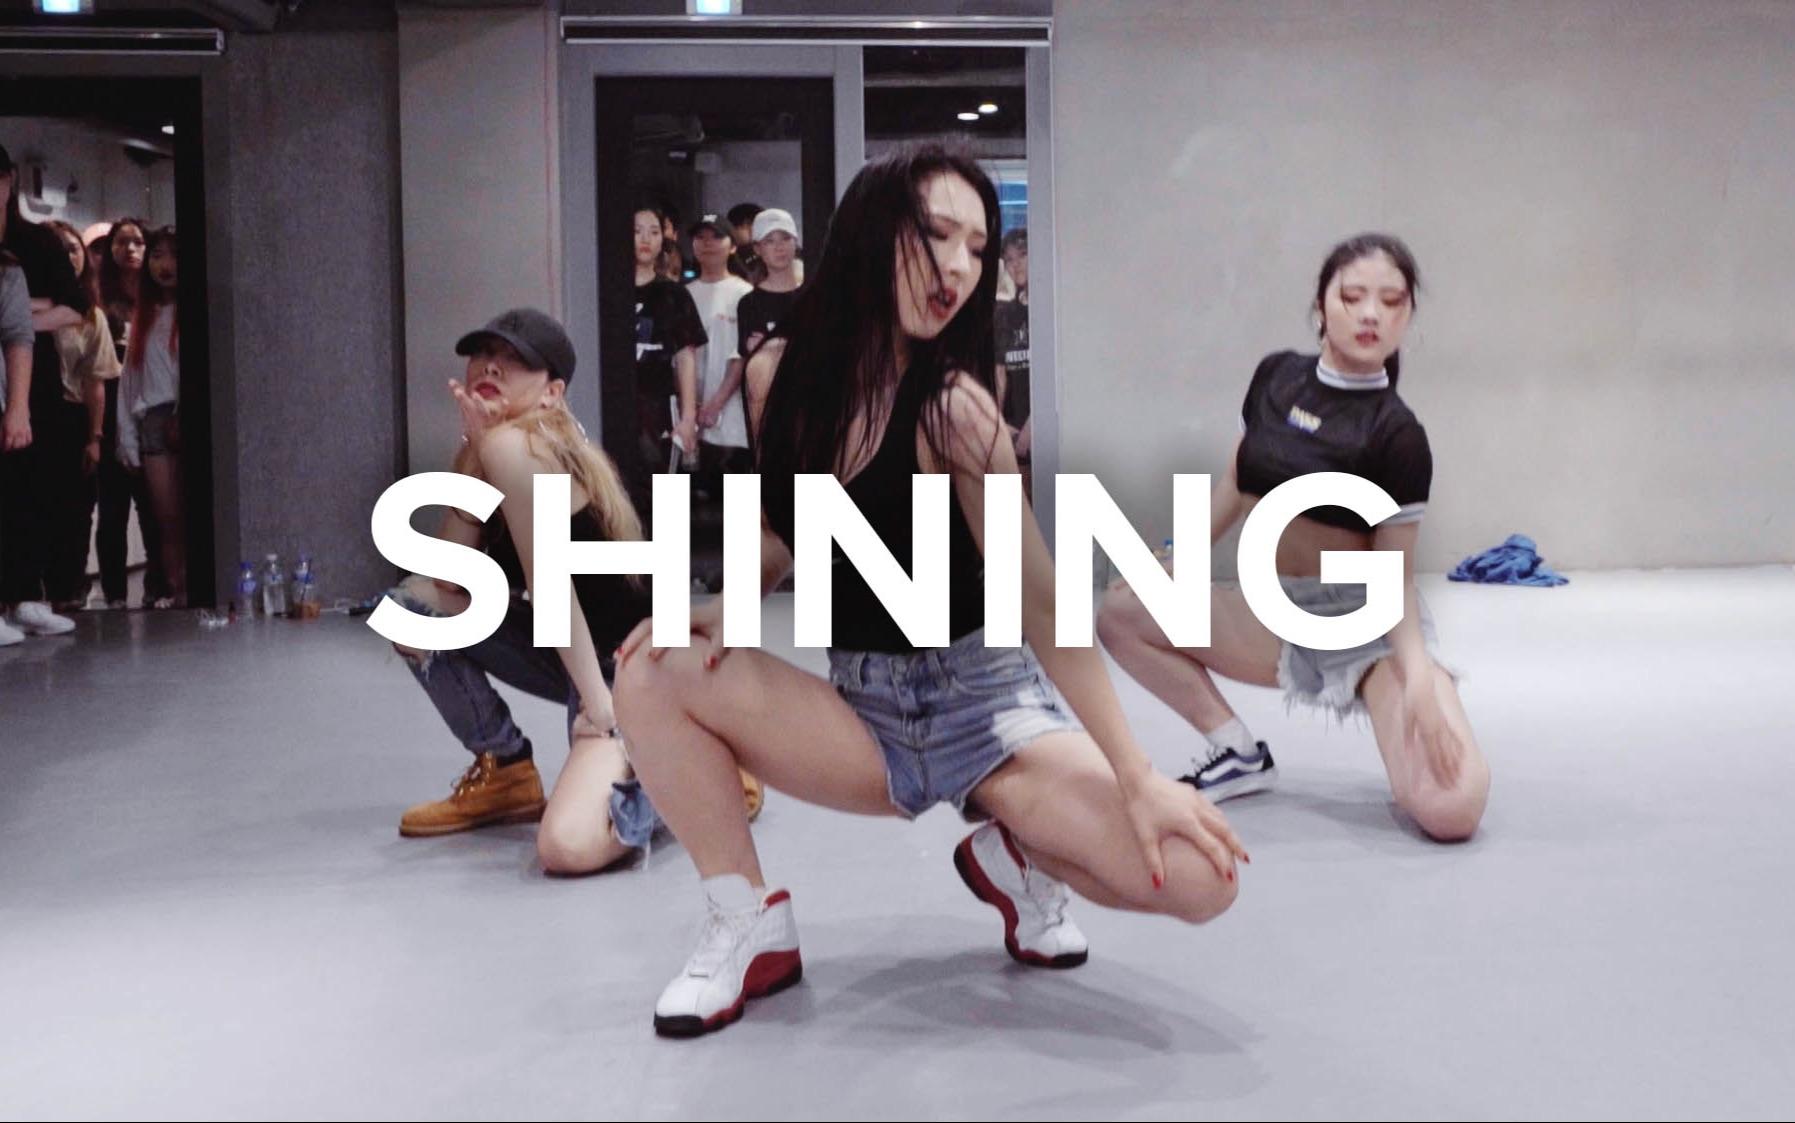 【1M】 Mina Myoung编舞Shining